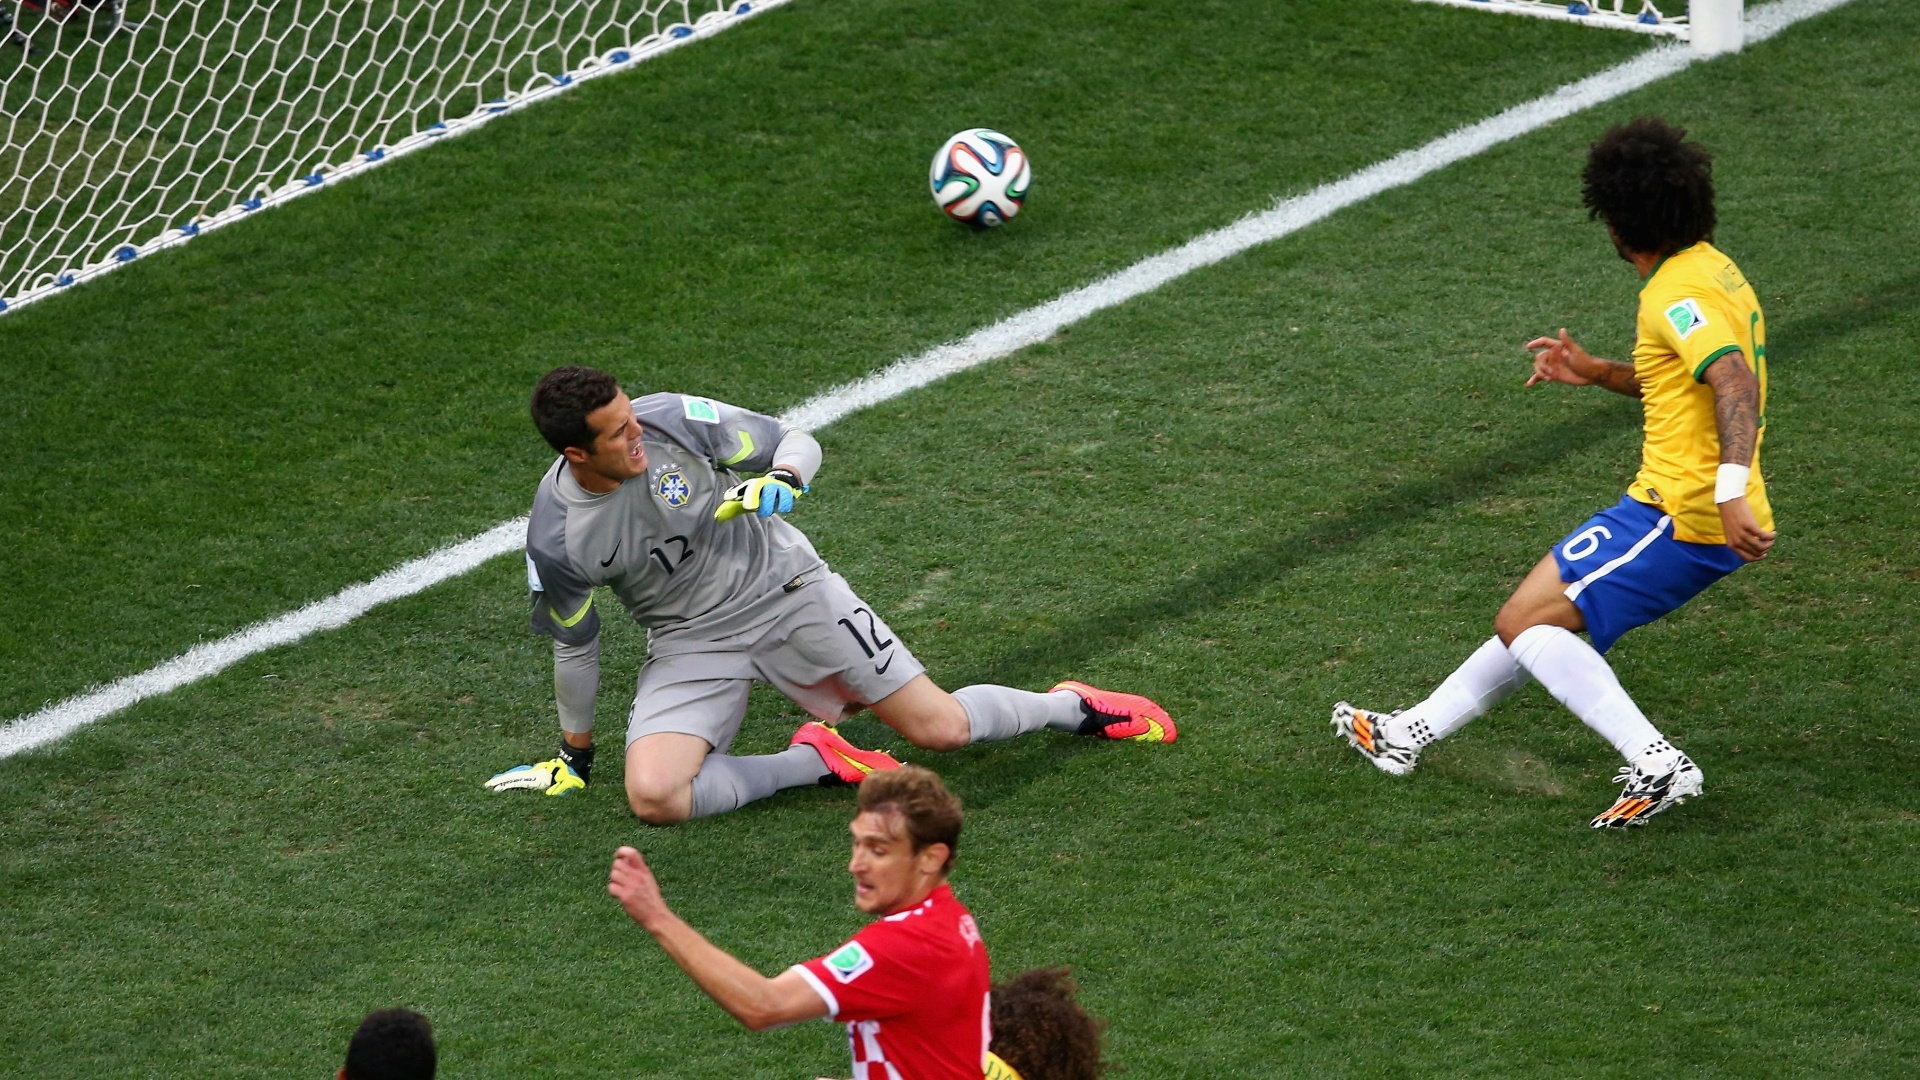 12.jun.2014 - Após cruzamento, Marcelo desvia a bola e faz gol contra, colocando a Croácia na frente do placar